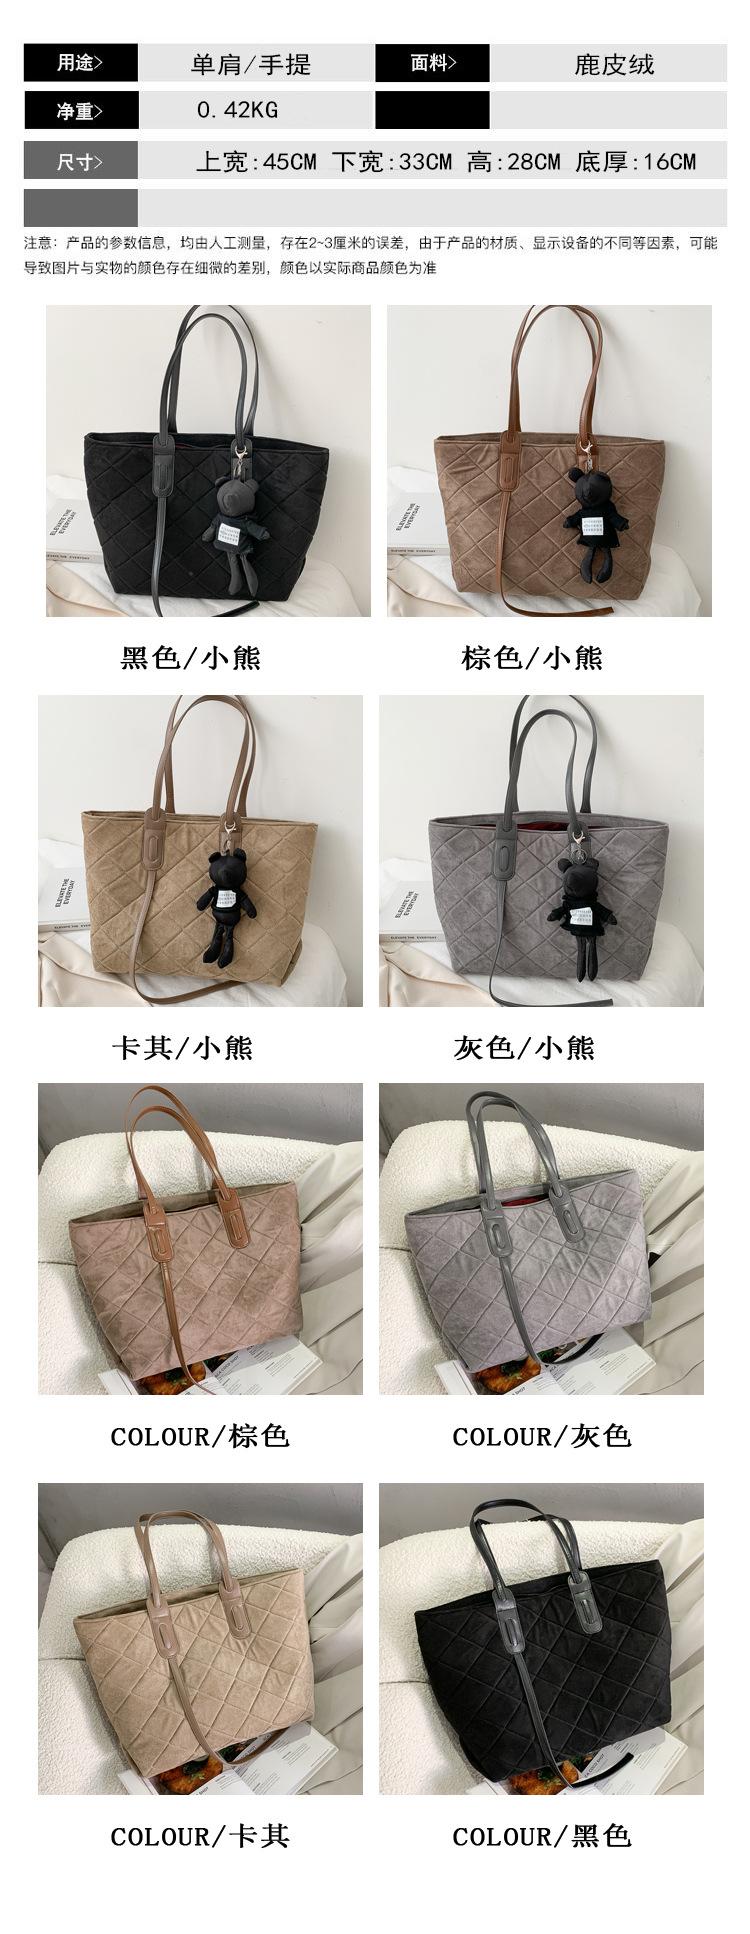 Autumn new trendy large-capacity shoulder portable tote handbags  NHTC267641